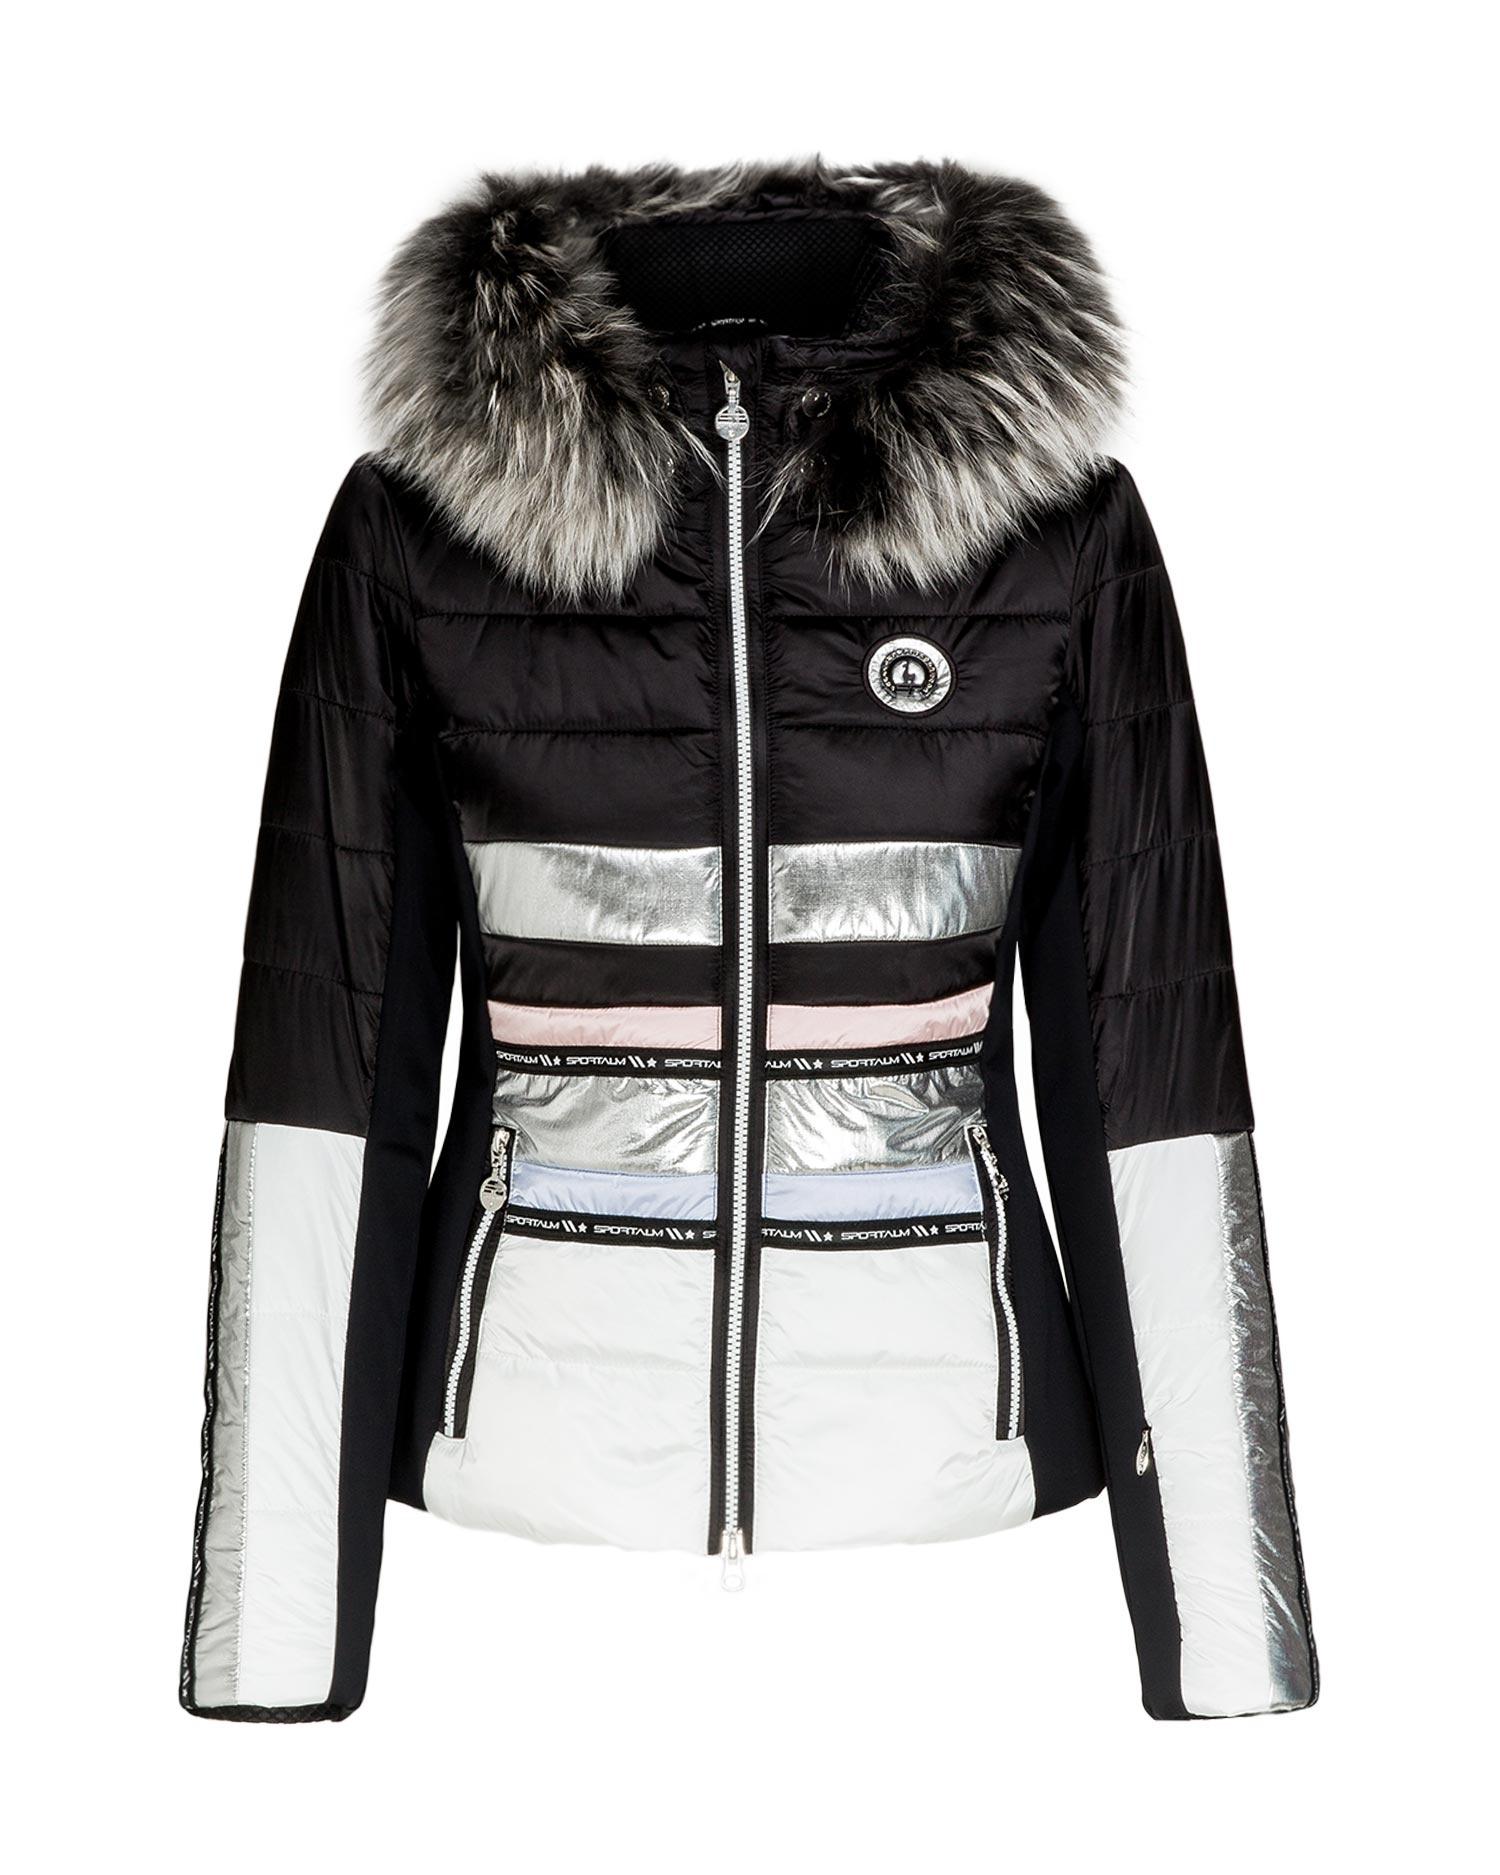 a013fdf88 Sportalm Escape Ladies Ski Jacket 2019 Black